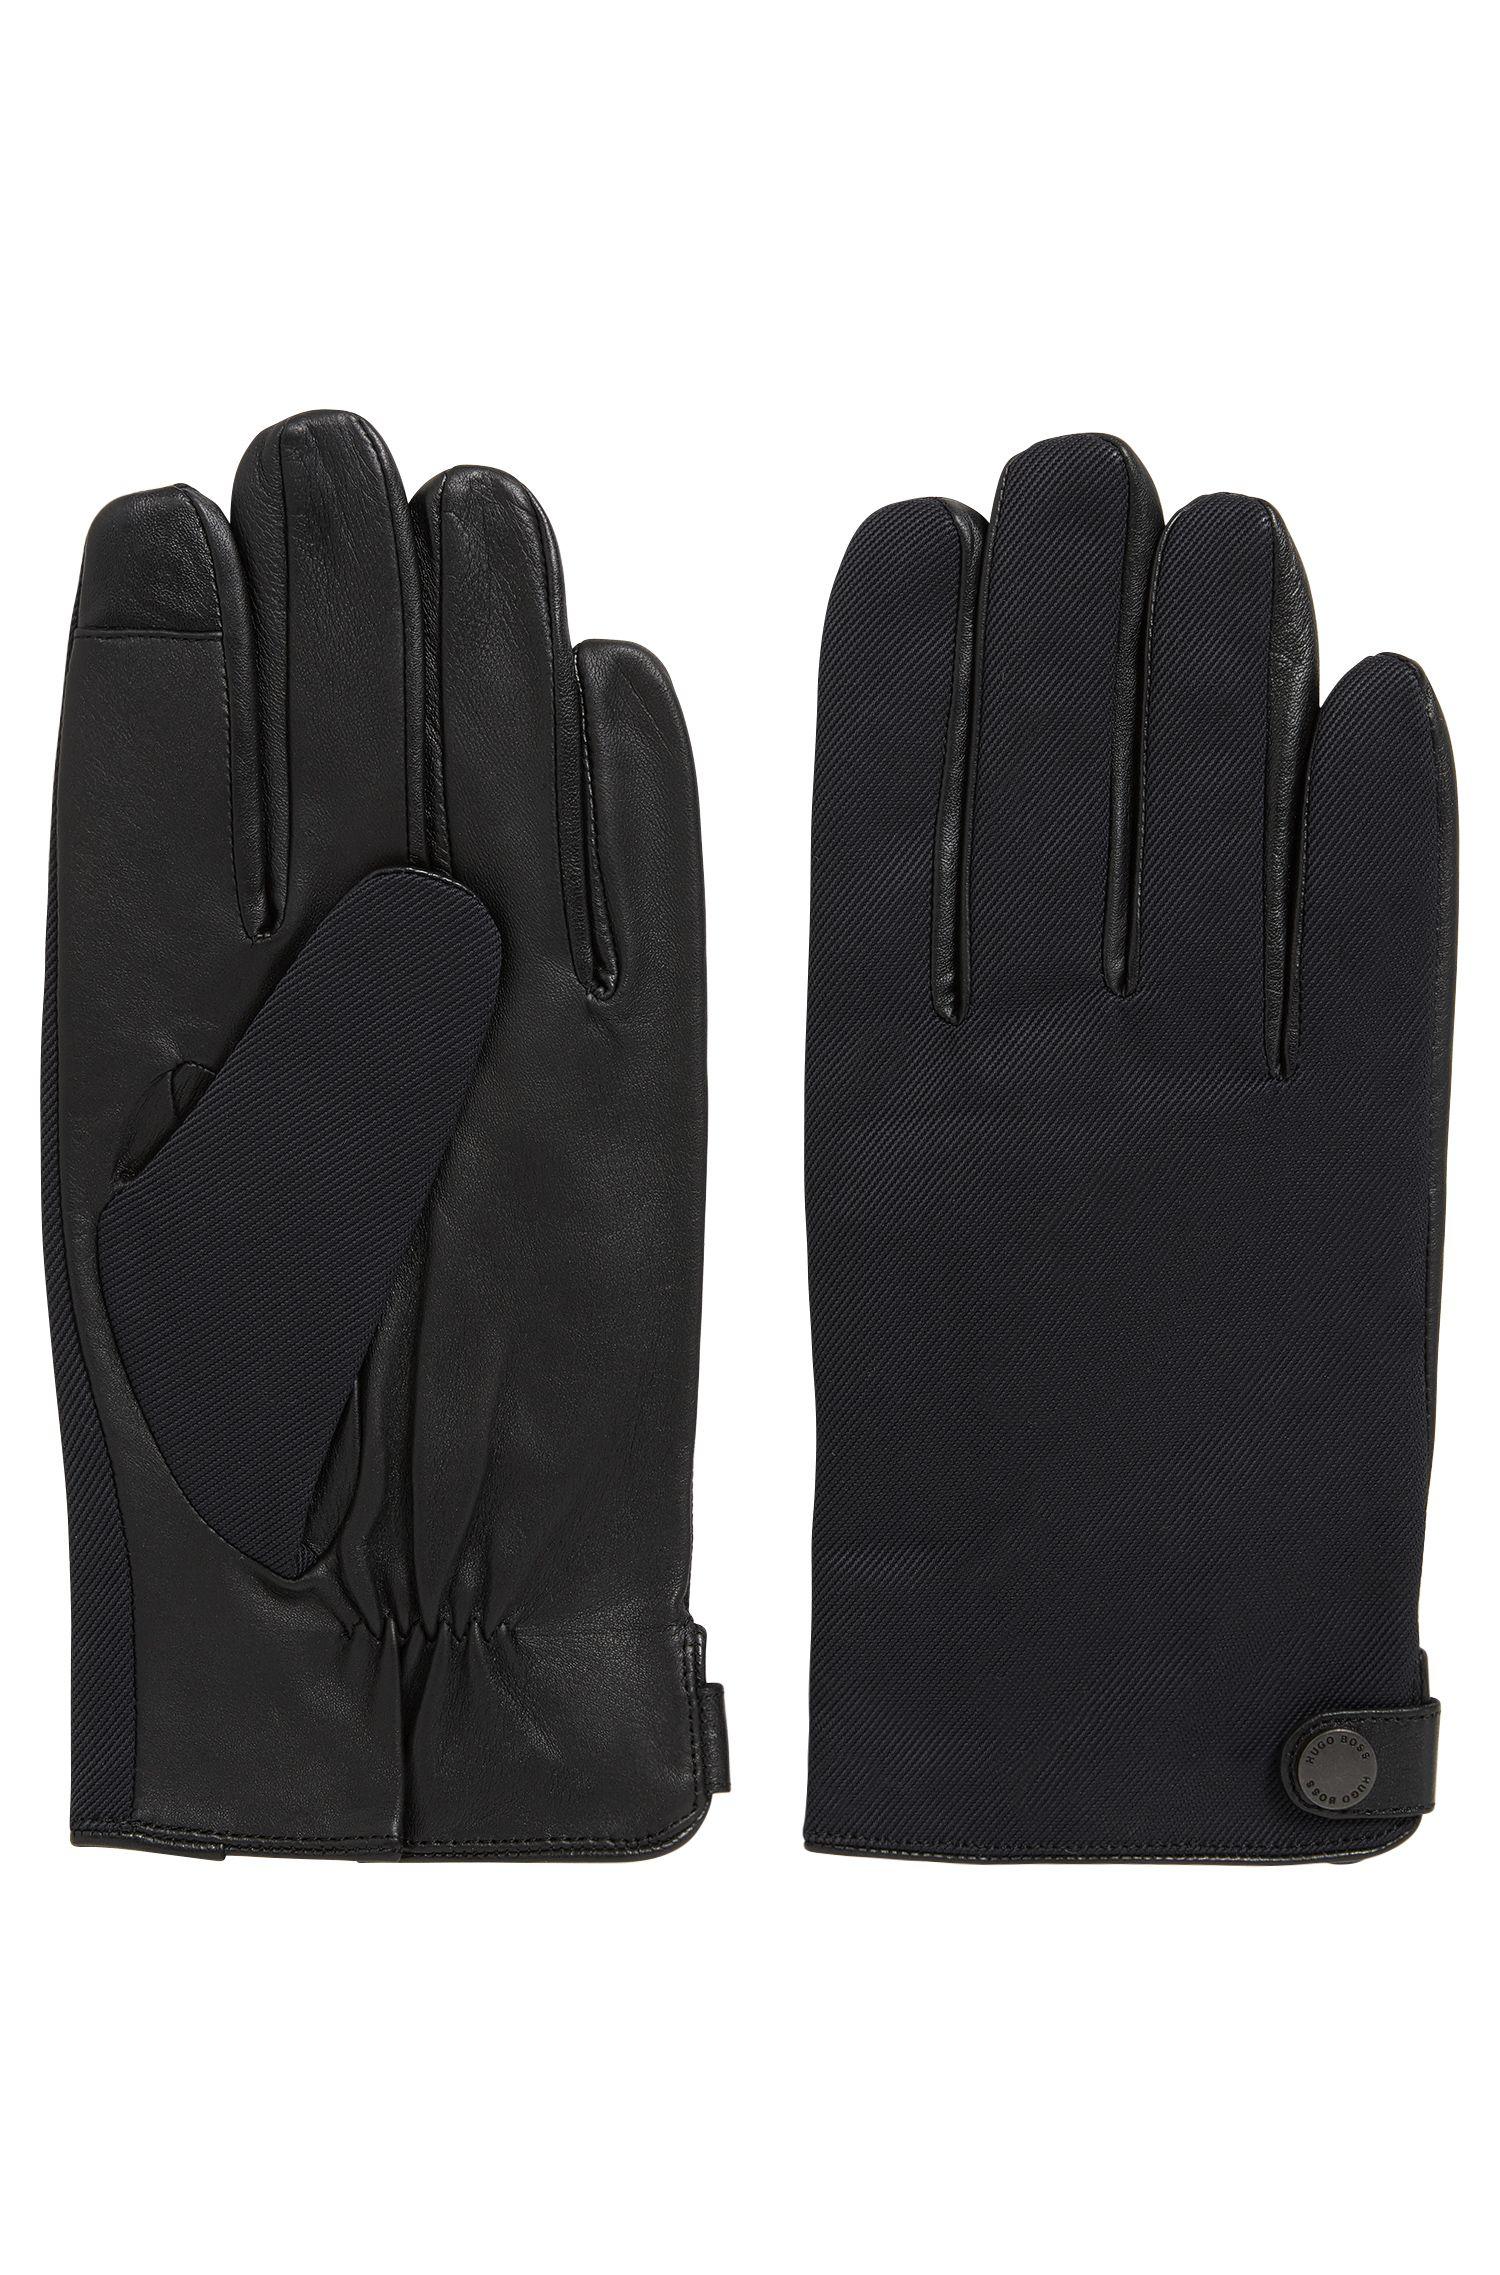 Nappa Leather & Wool Blend Tech Touch Glove | Helgan TT